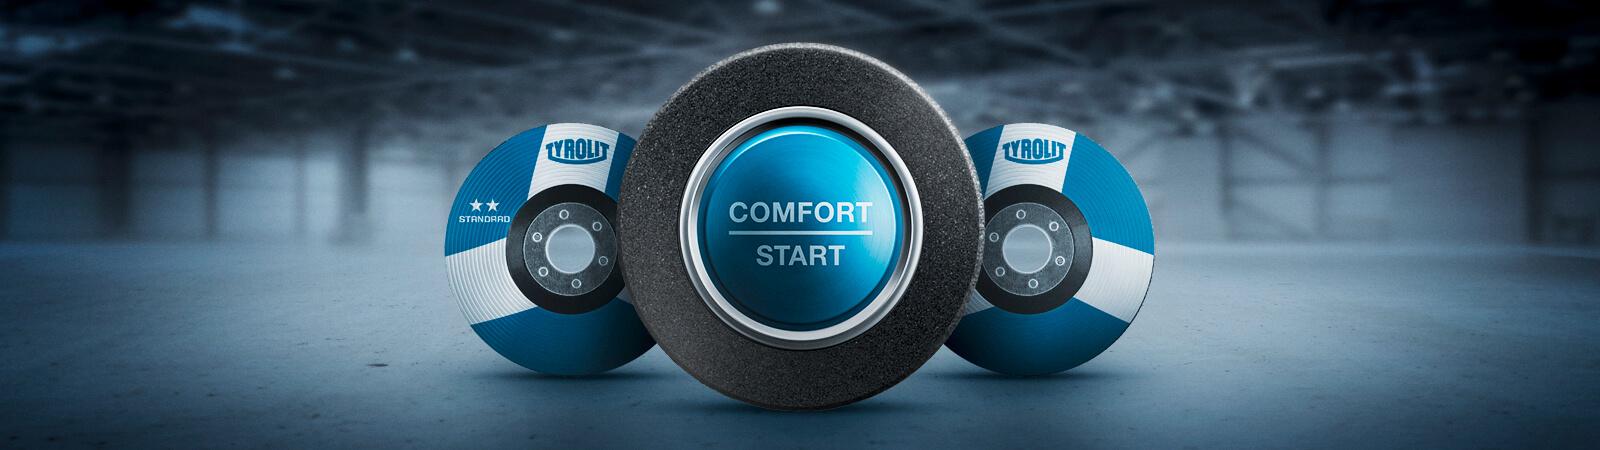 comfort_start_sujet_microsite